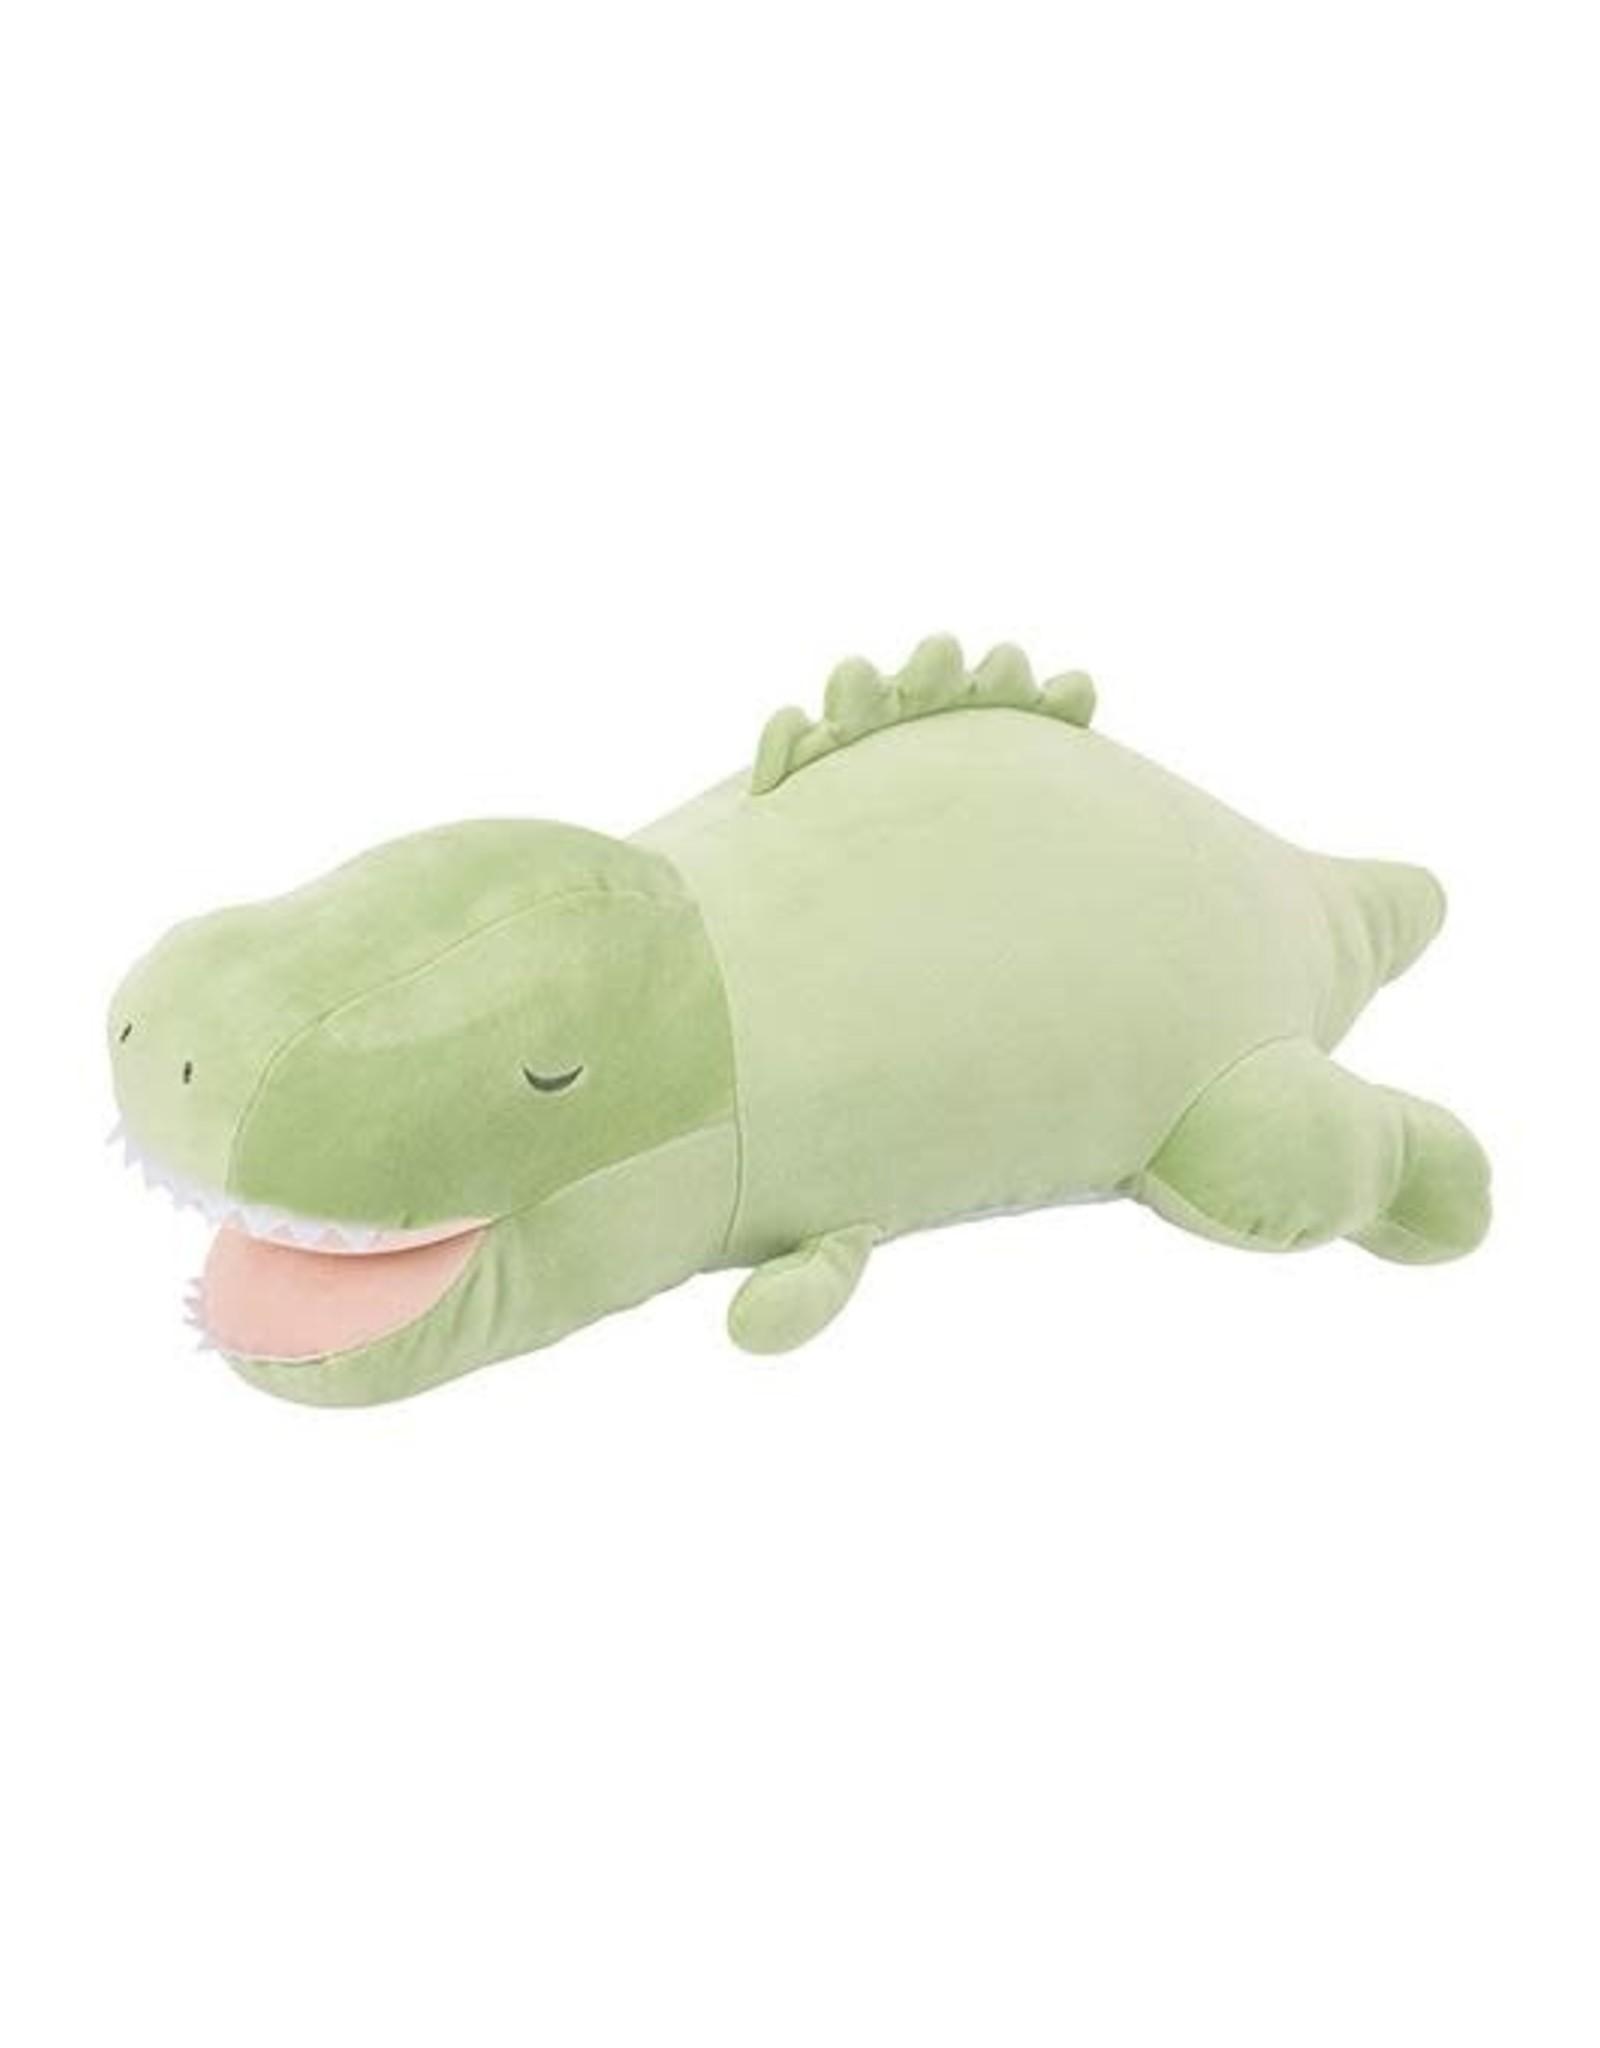 Nemu Nemu TIRANO - Le Dinosaure - Small